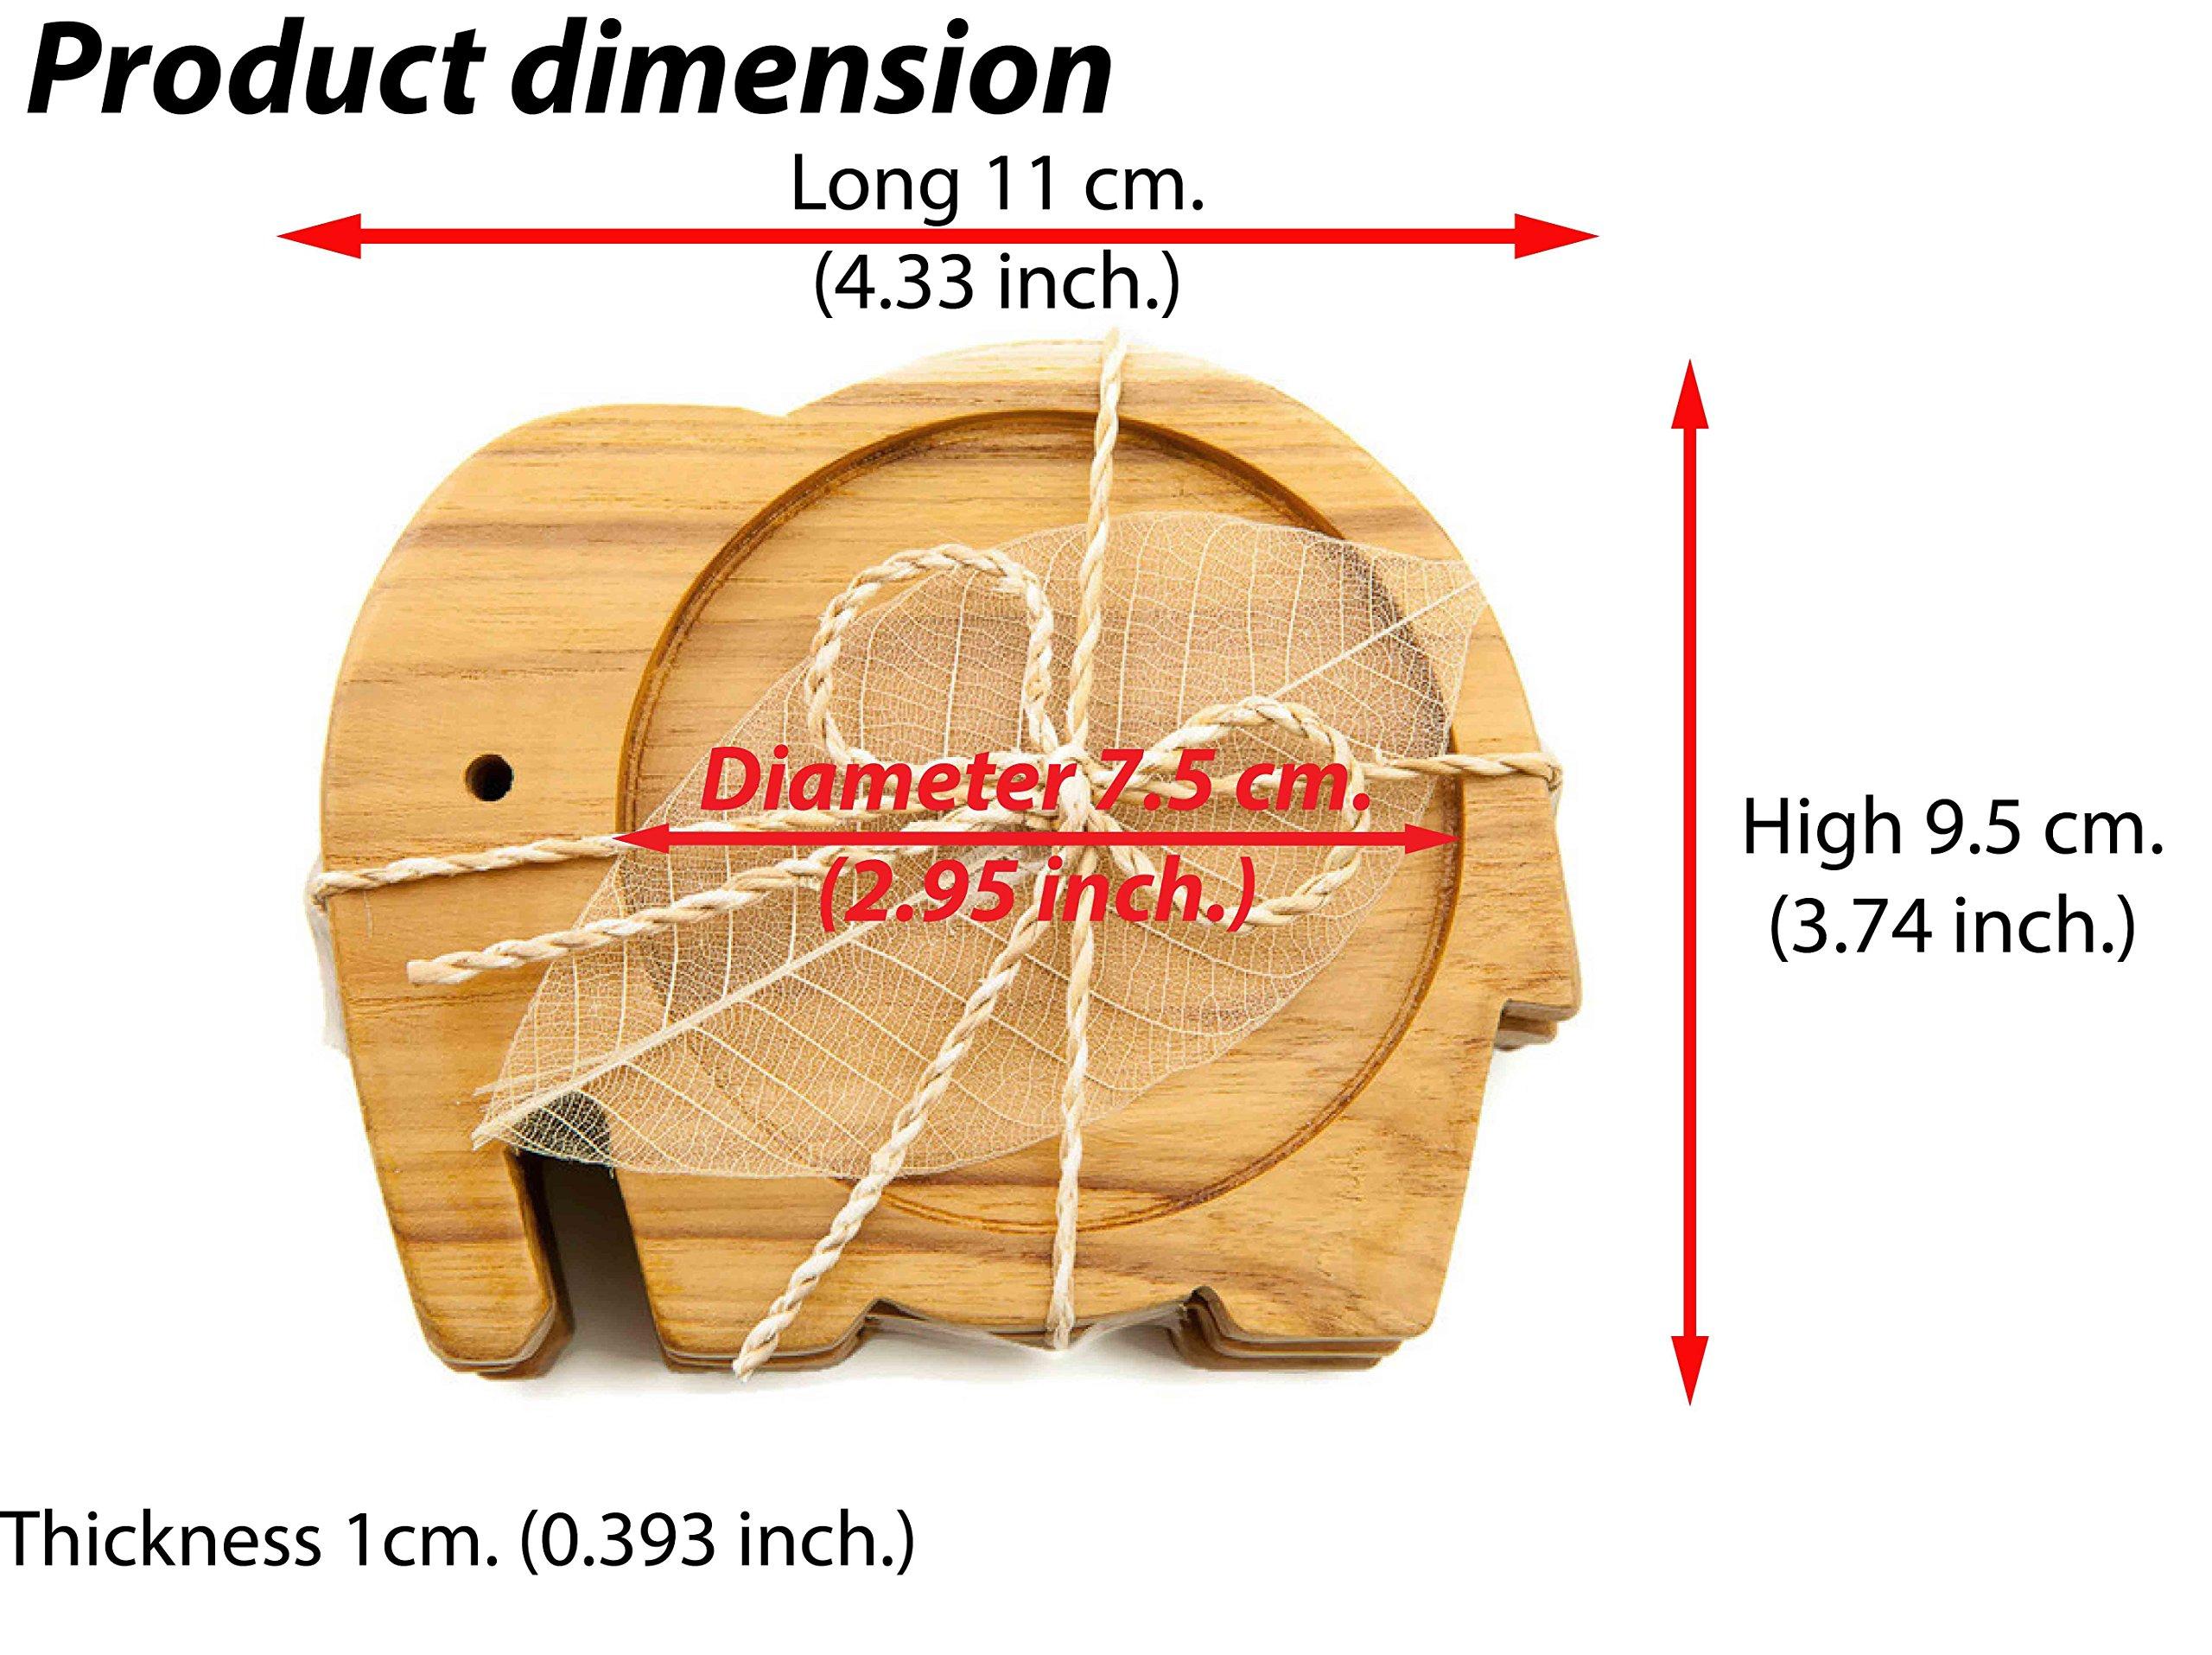 IYARA CRAFT Wood Coasters for Drinks Tea Cups Saucers,Table topper decoration set Elephant shape (Teak wood)